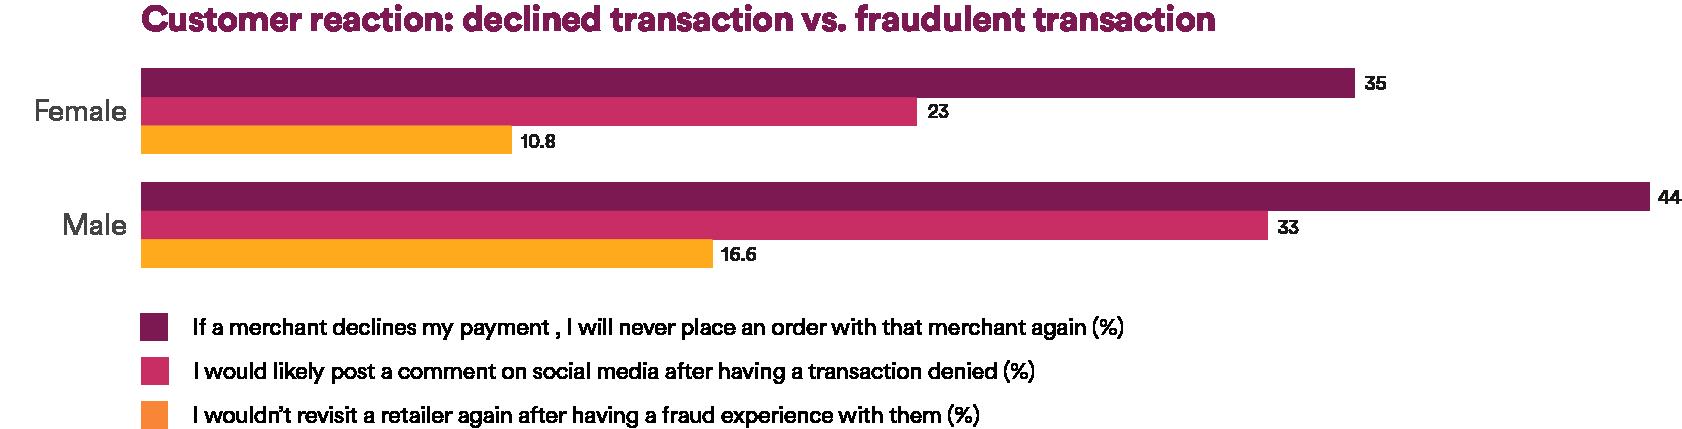 Customer reaction: declined transaction vs. fraudulent transaction